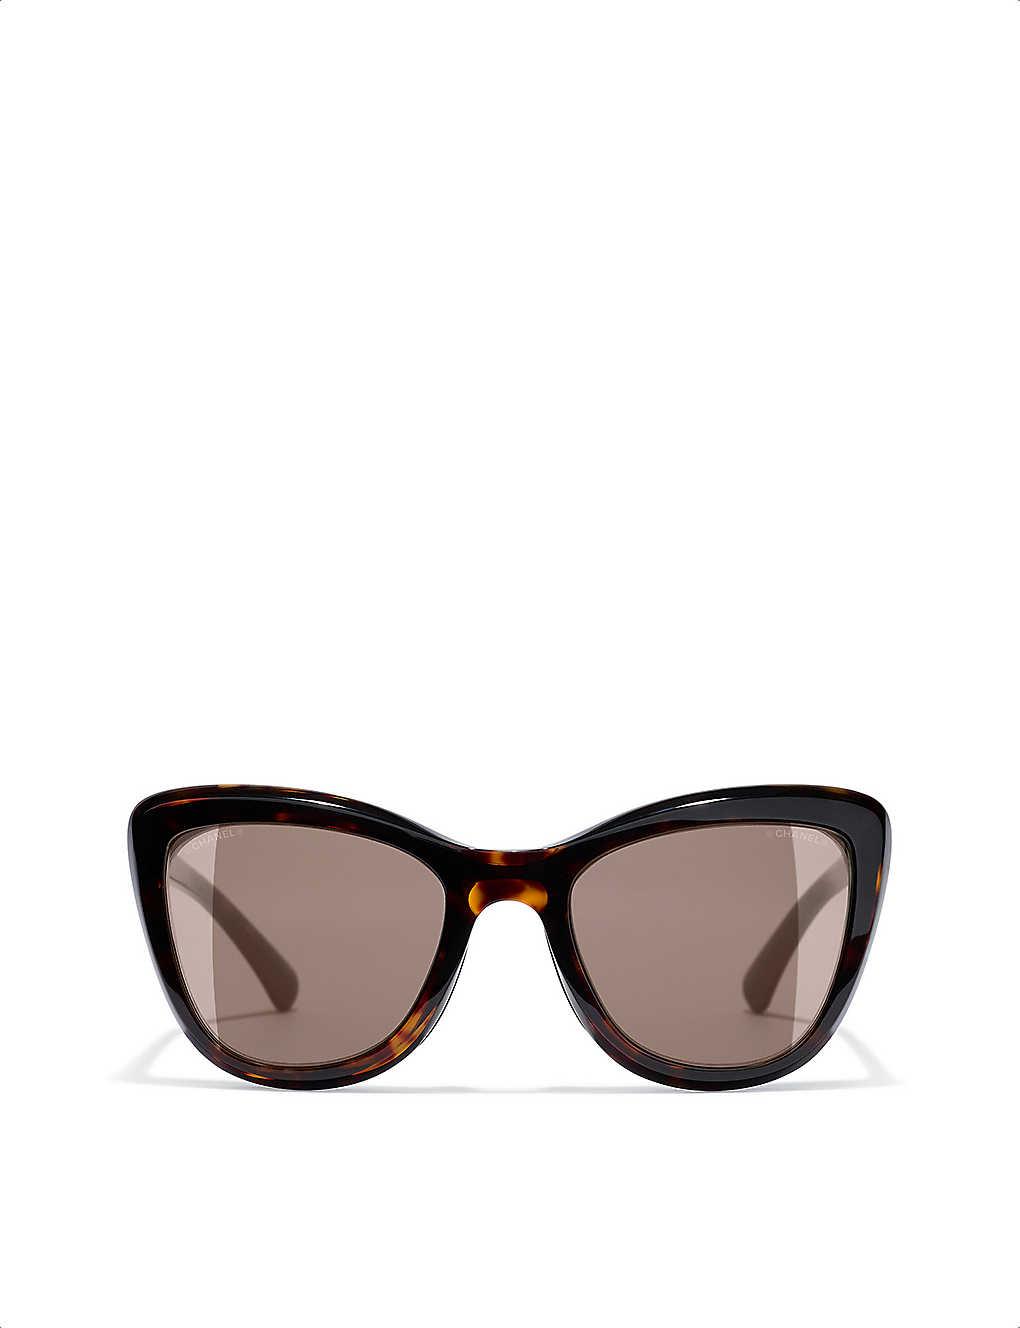 CHANEL - Clip On sunglasses | Selfridges.com